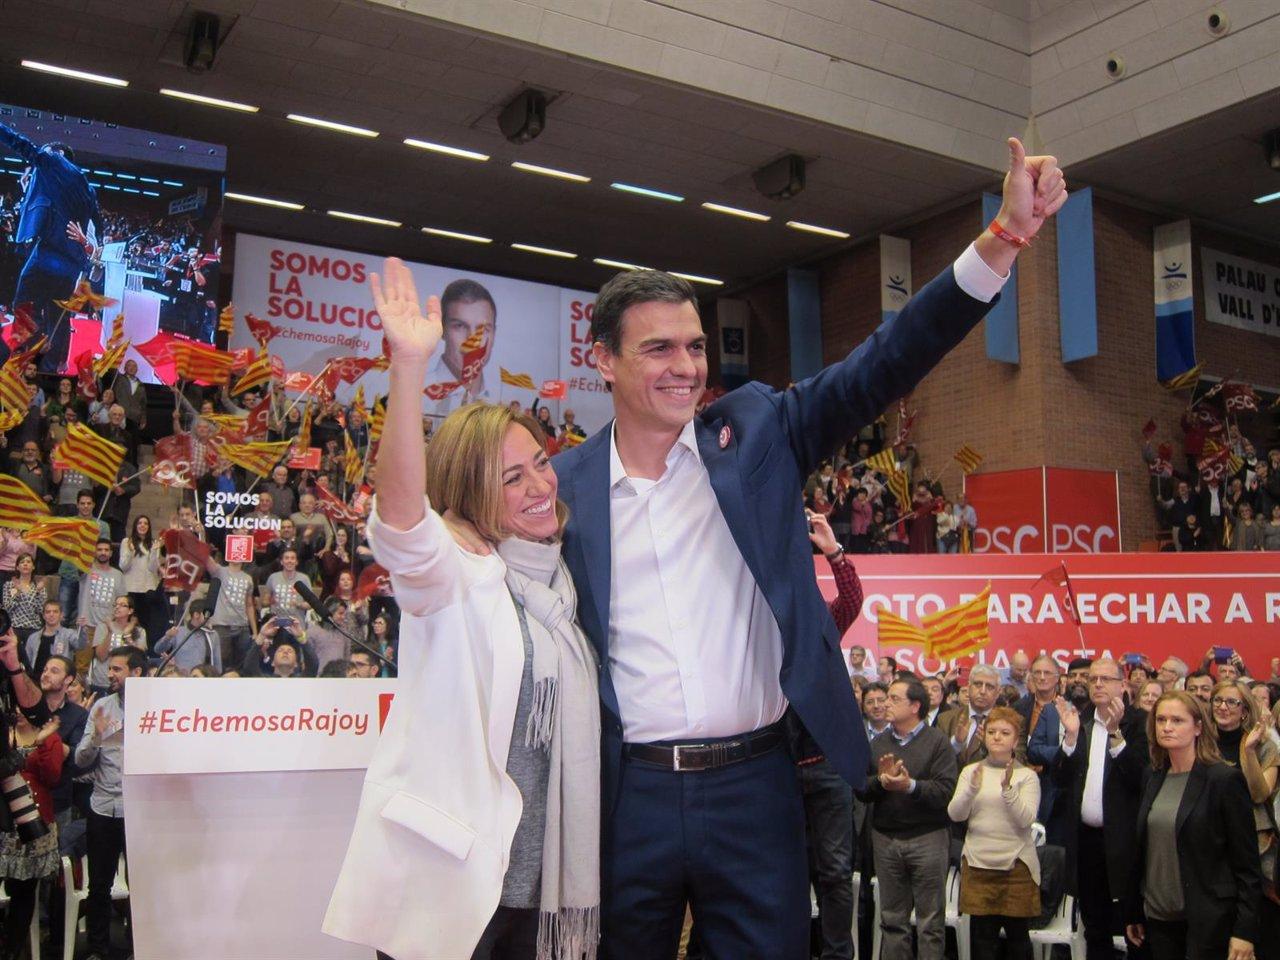 Carme Chacón (PSC) Pedro Sánchez (PSOE)